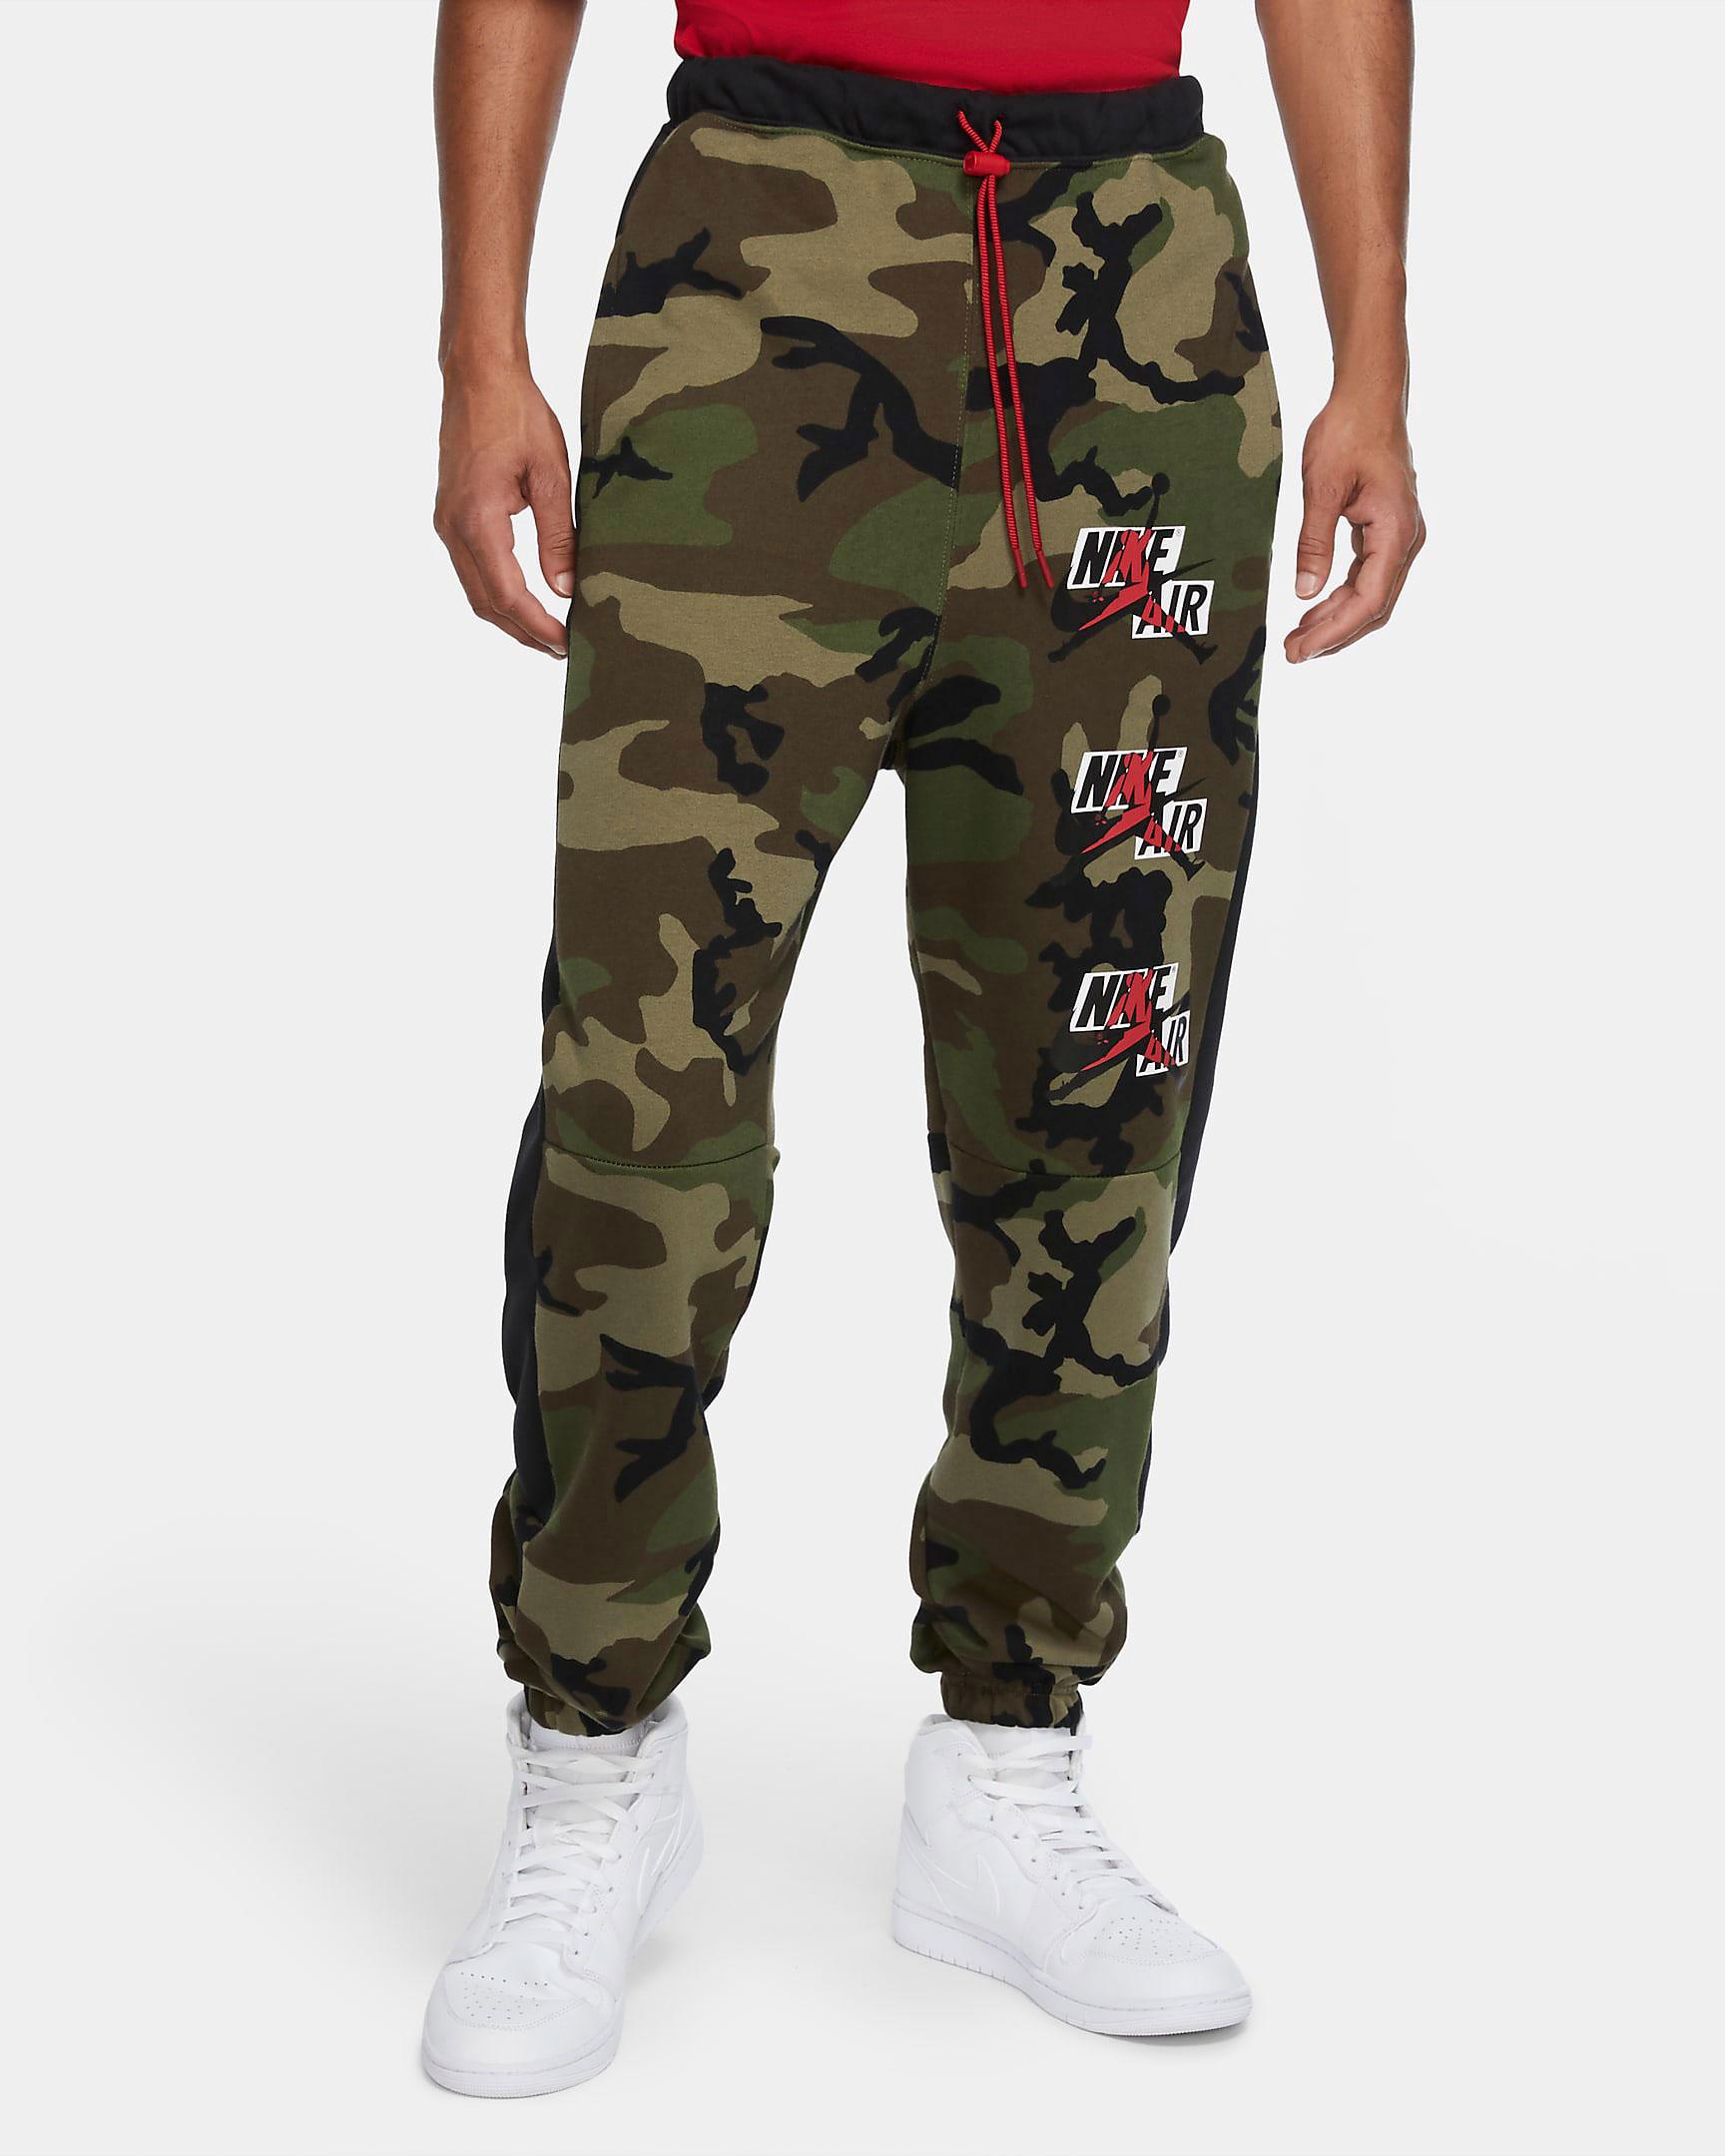 air-jordan-1-mid-banned-camo-jogger-pants-match